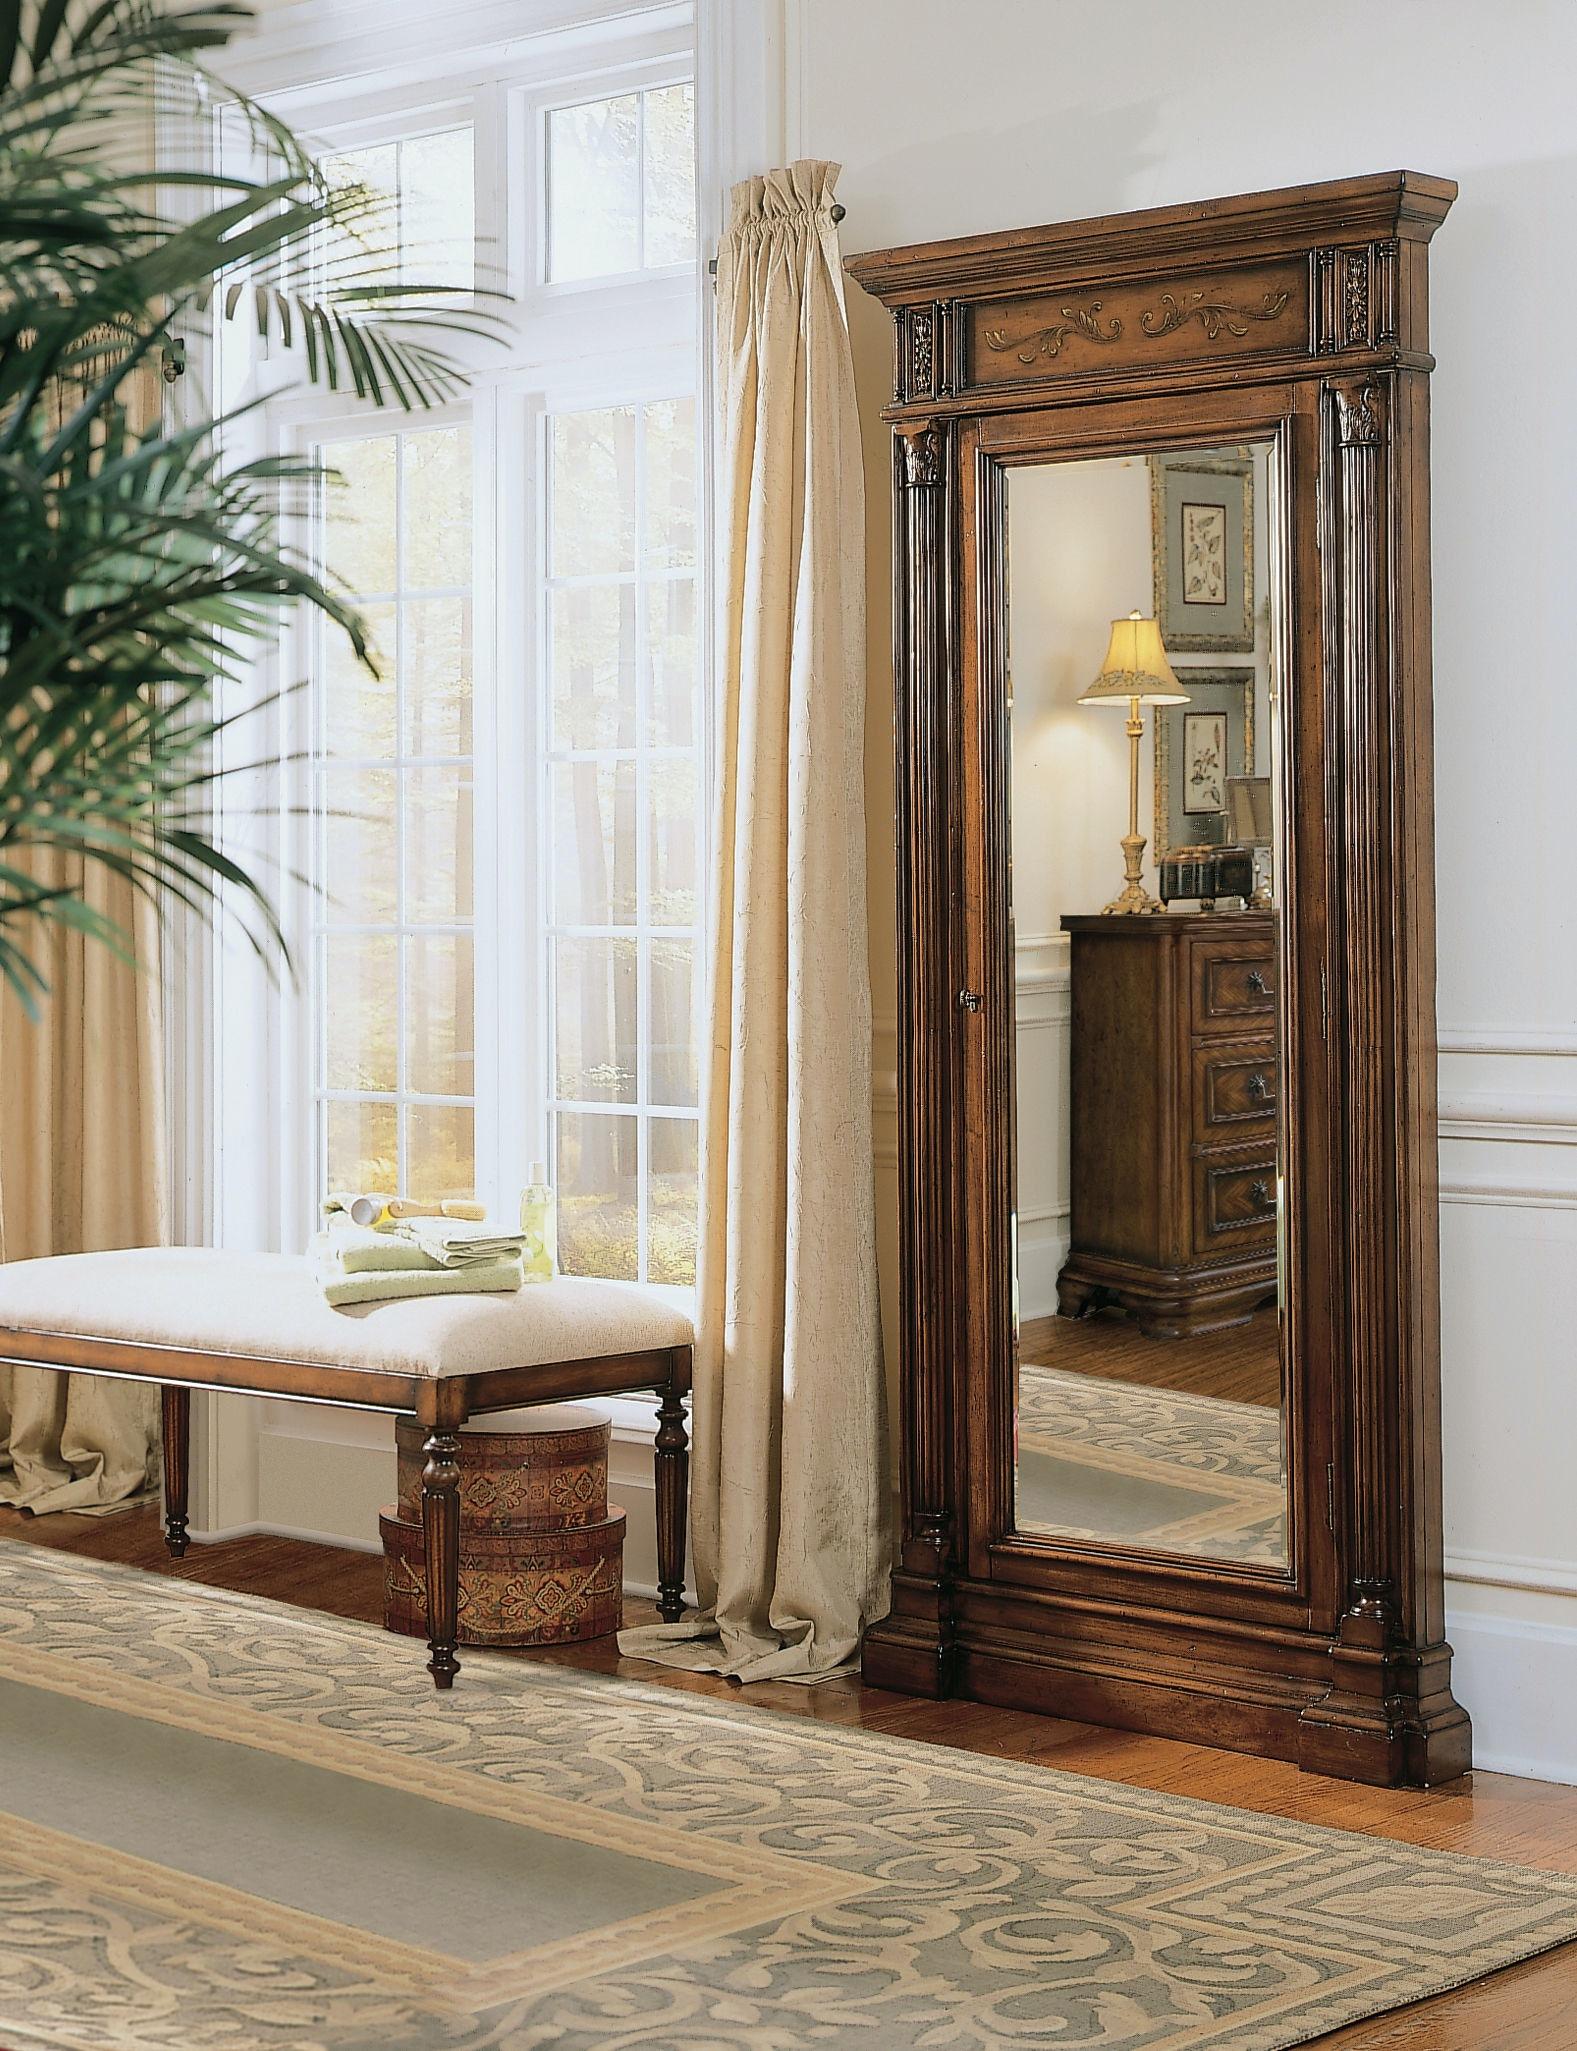 hooker furniture floor mirror wjewelry armoire storage . hooker furniture accents floor mirror wjewelry armoire storage